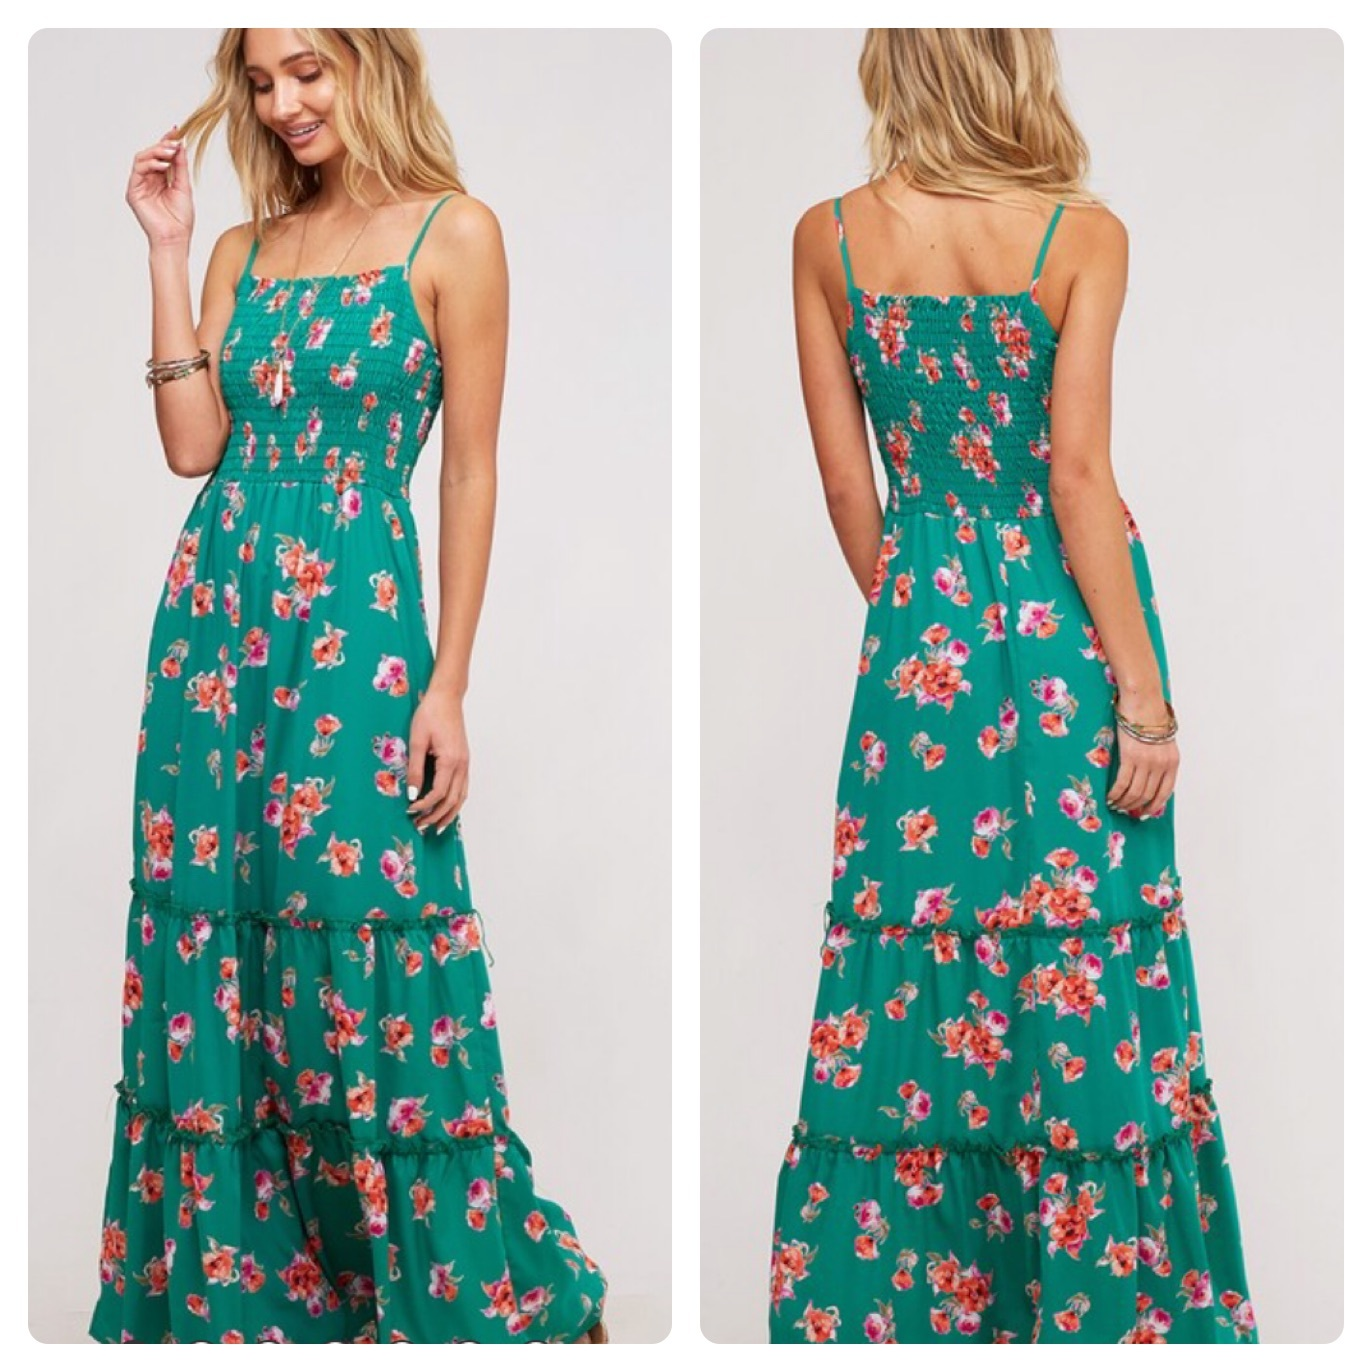 FLORAL DRESS   $40